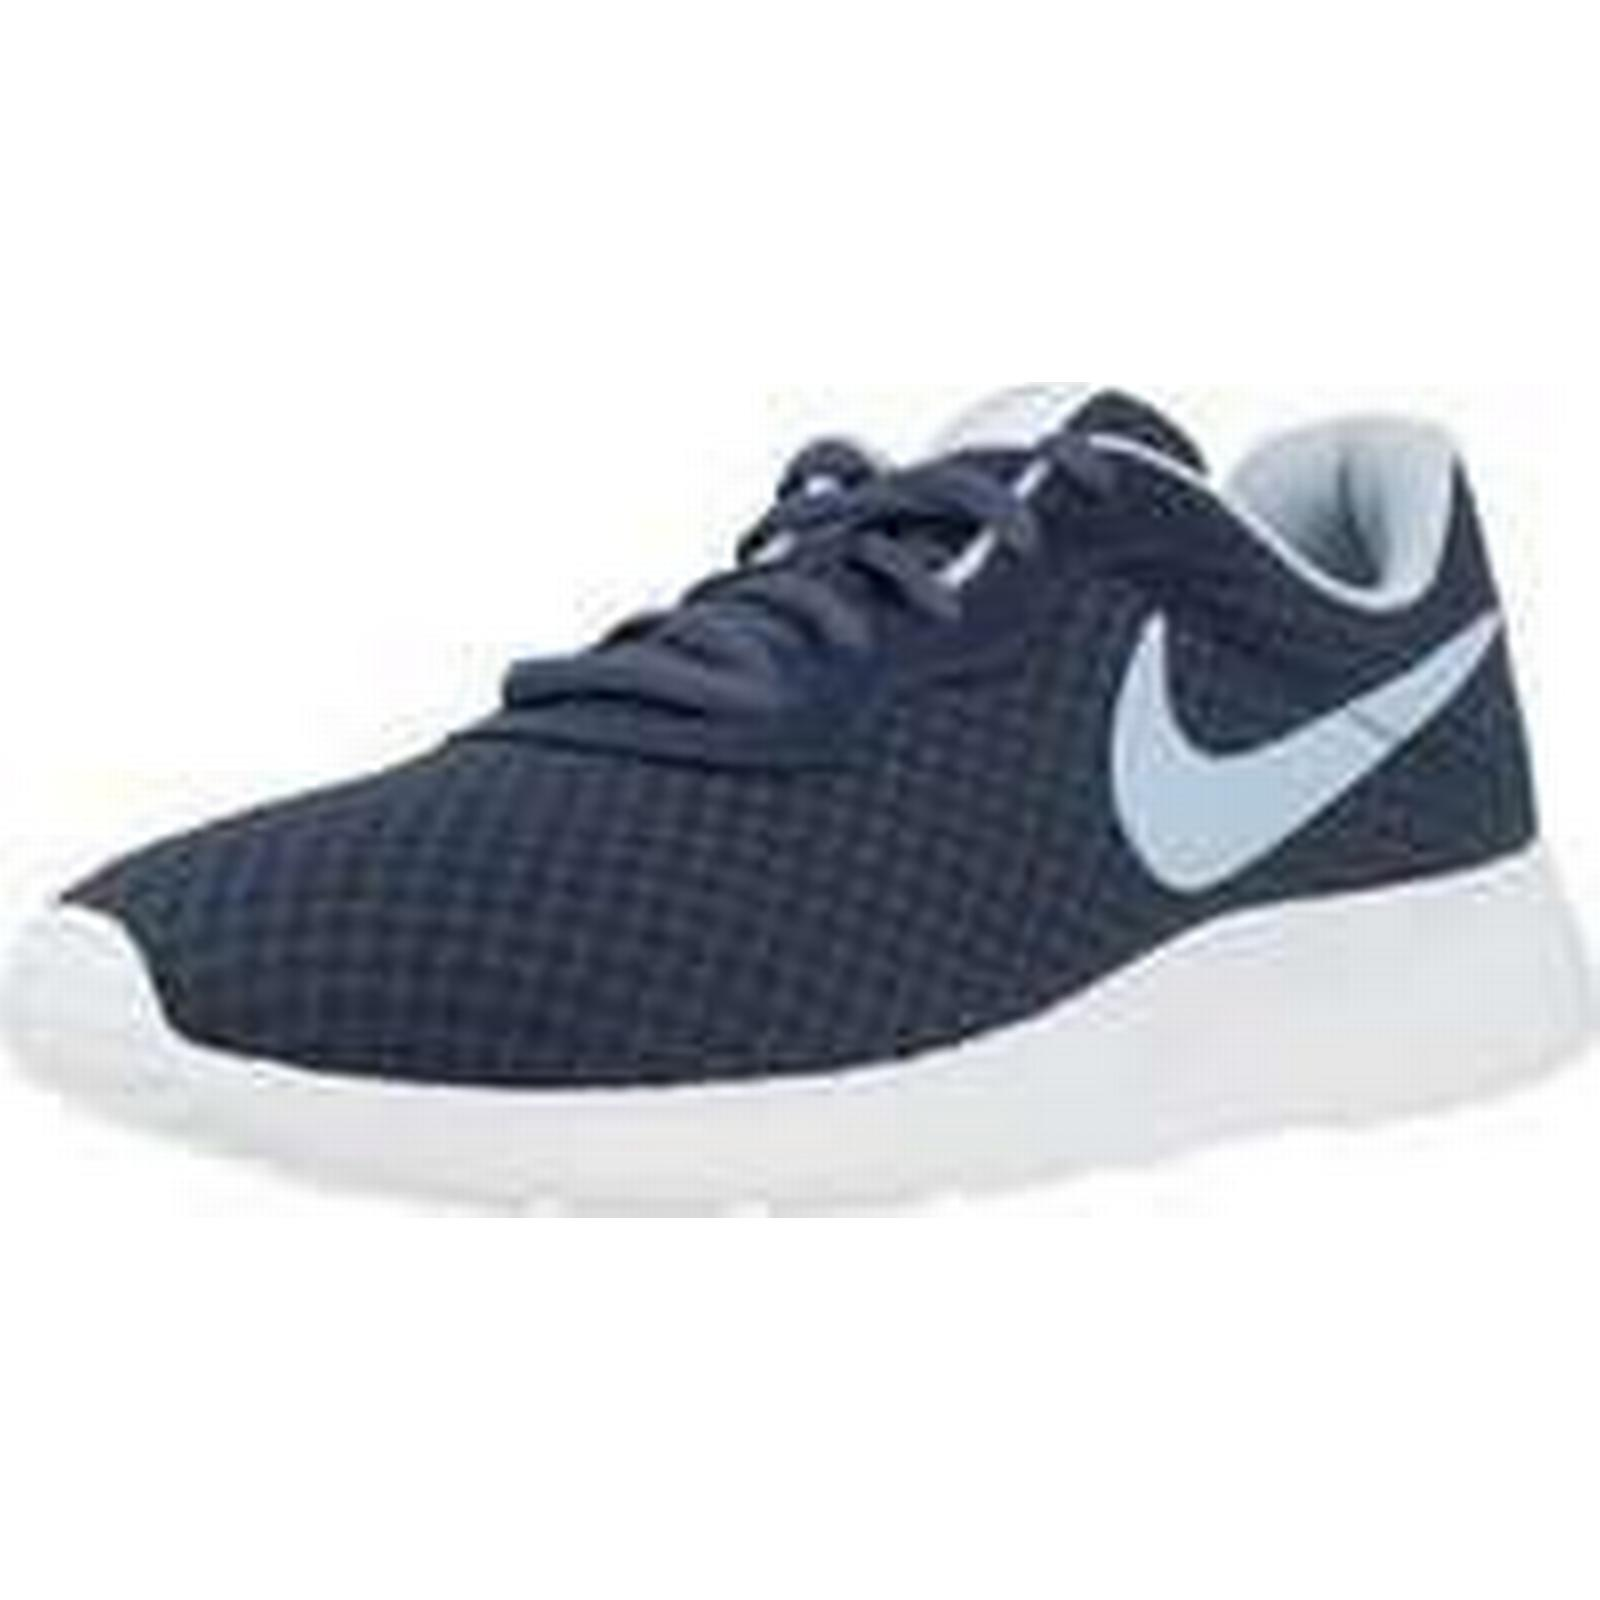 Spartoo.co.uk Nike WMNS TANJUN in women's Shoes (Trainers) in TANJUN Blue 1c5f29